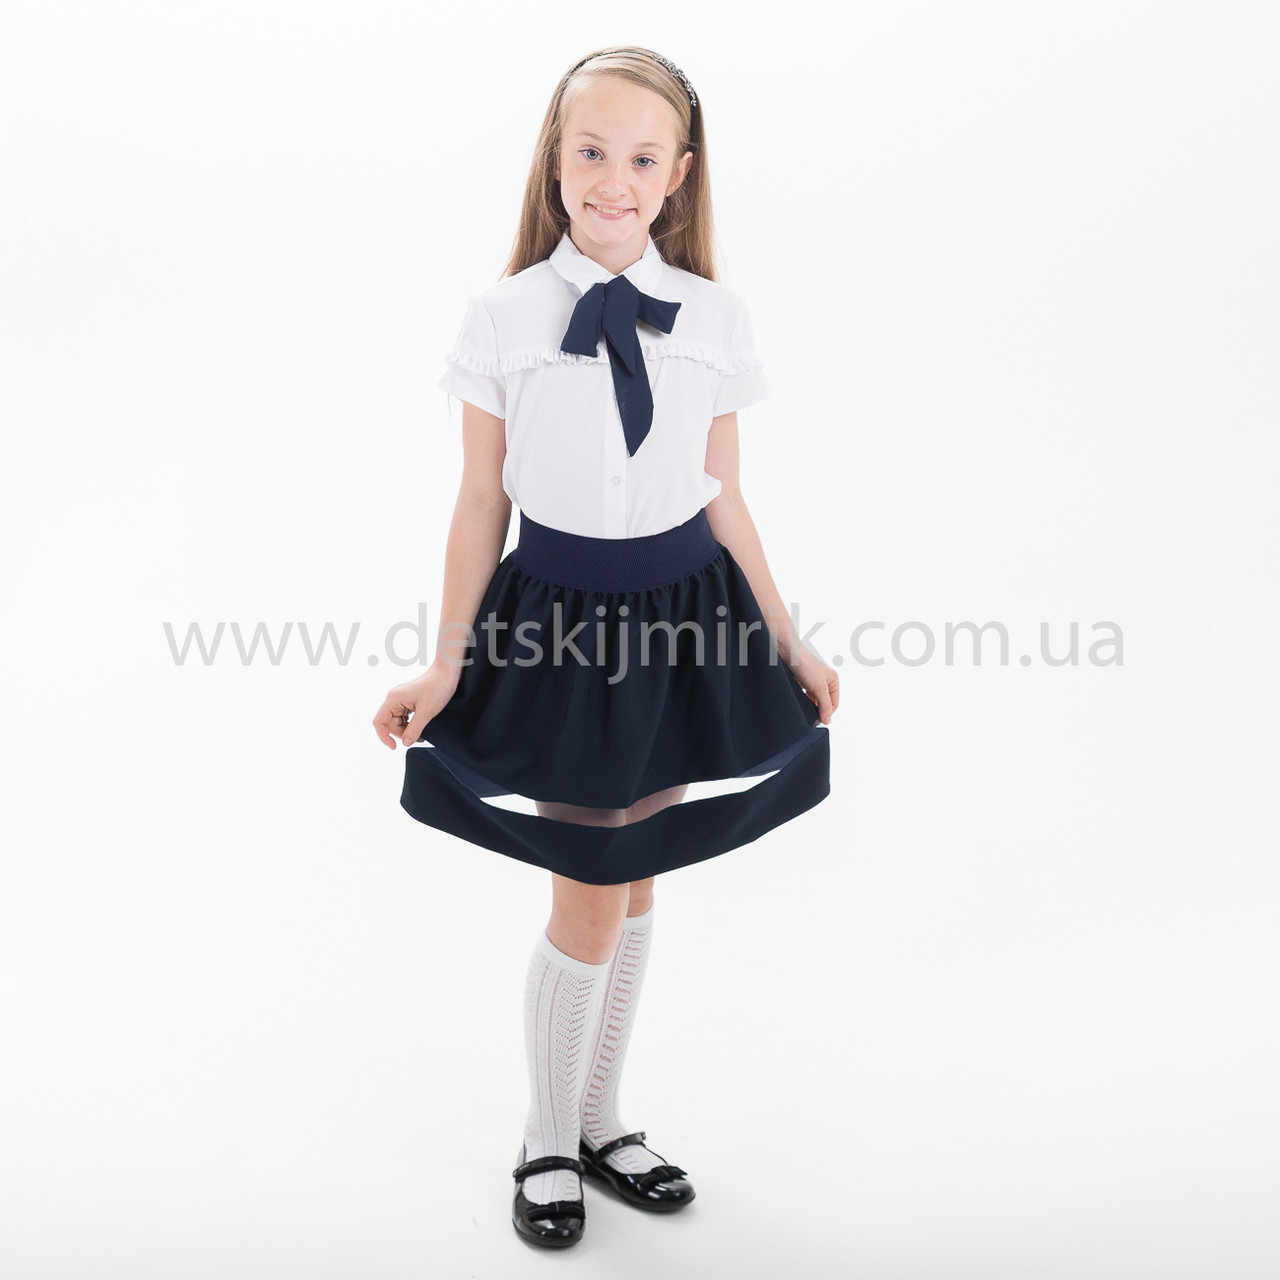 Юбка для девочки для школы  ,Новинка 2018 года, фото 1